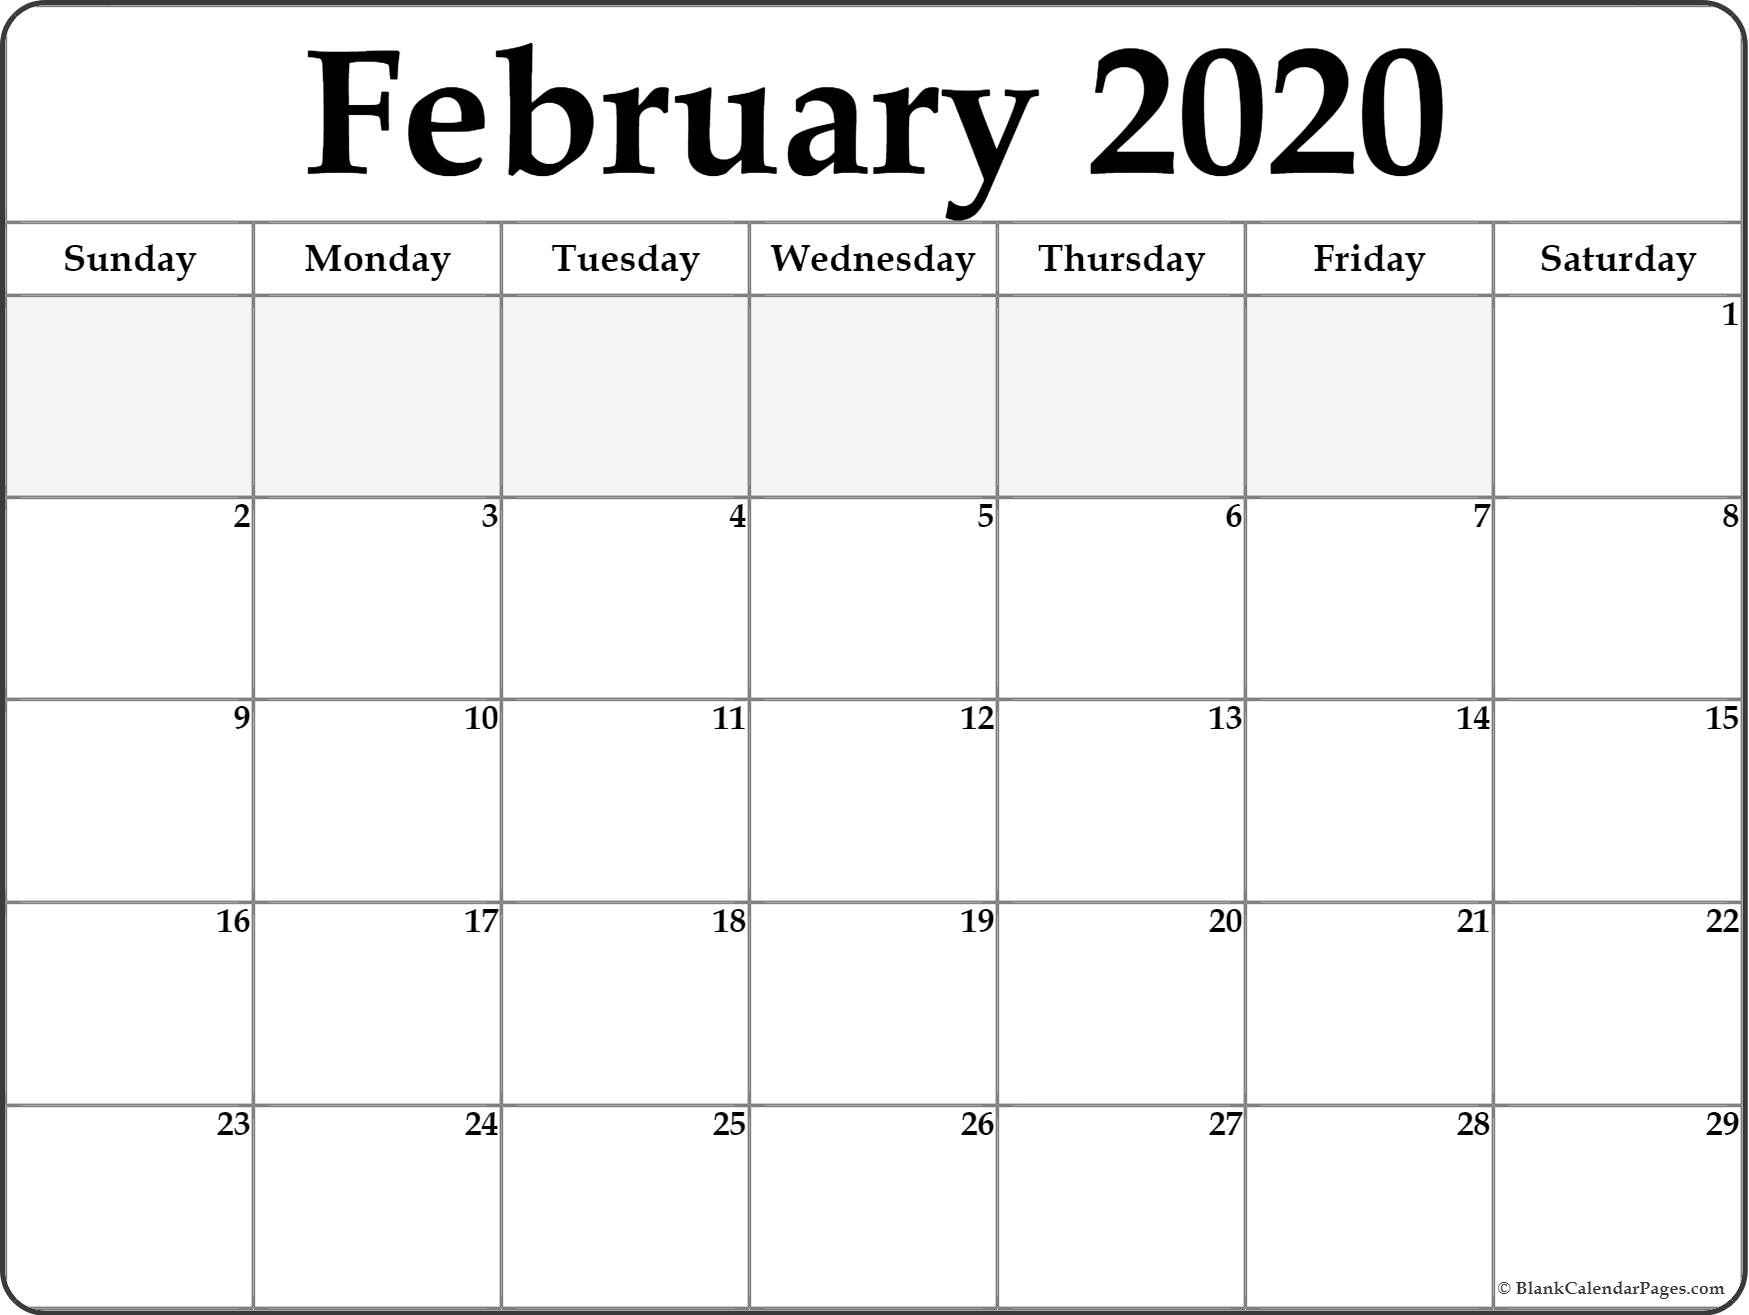 Free Printable Calander 2020 Victoria Wiht Spaces To Write - Calendar Inspiration Design